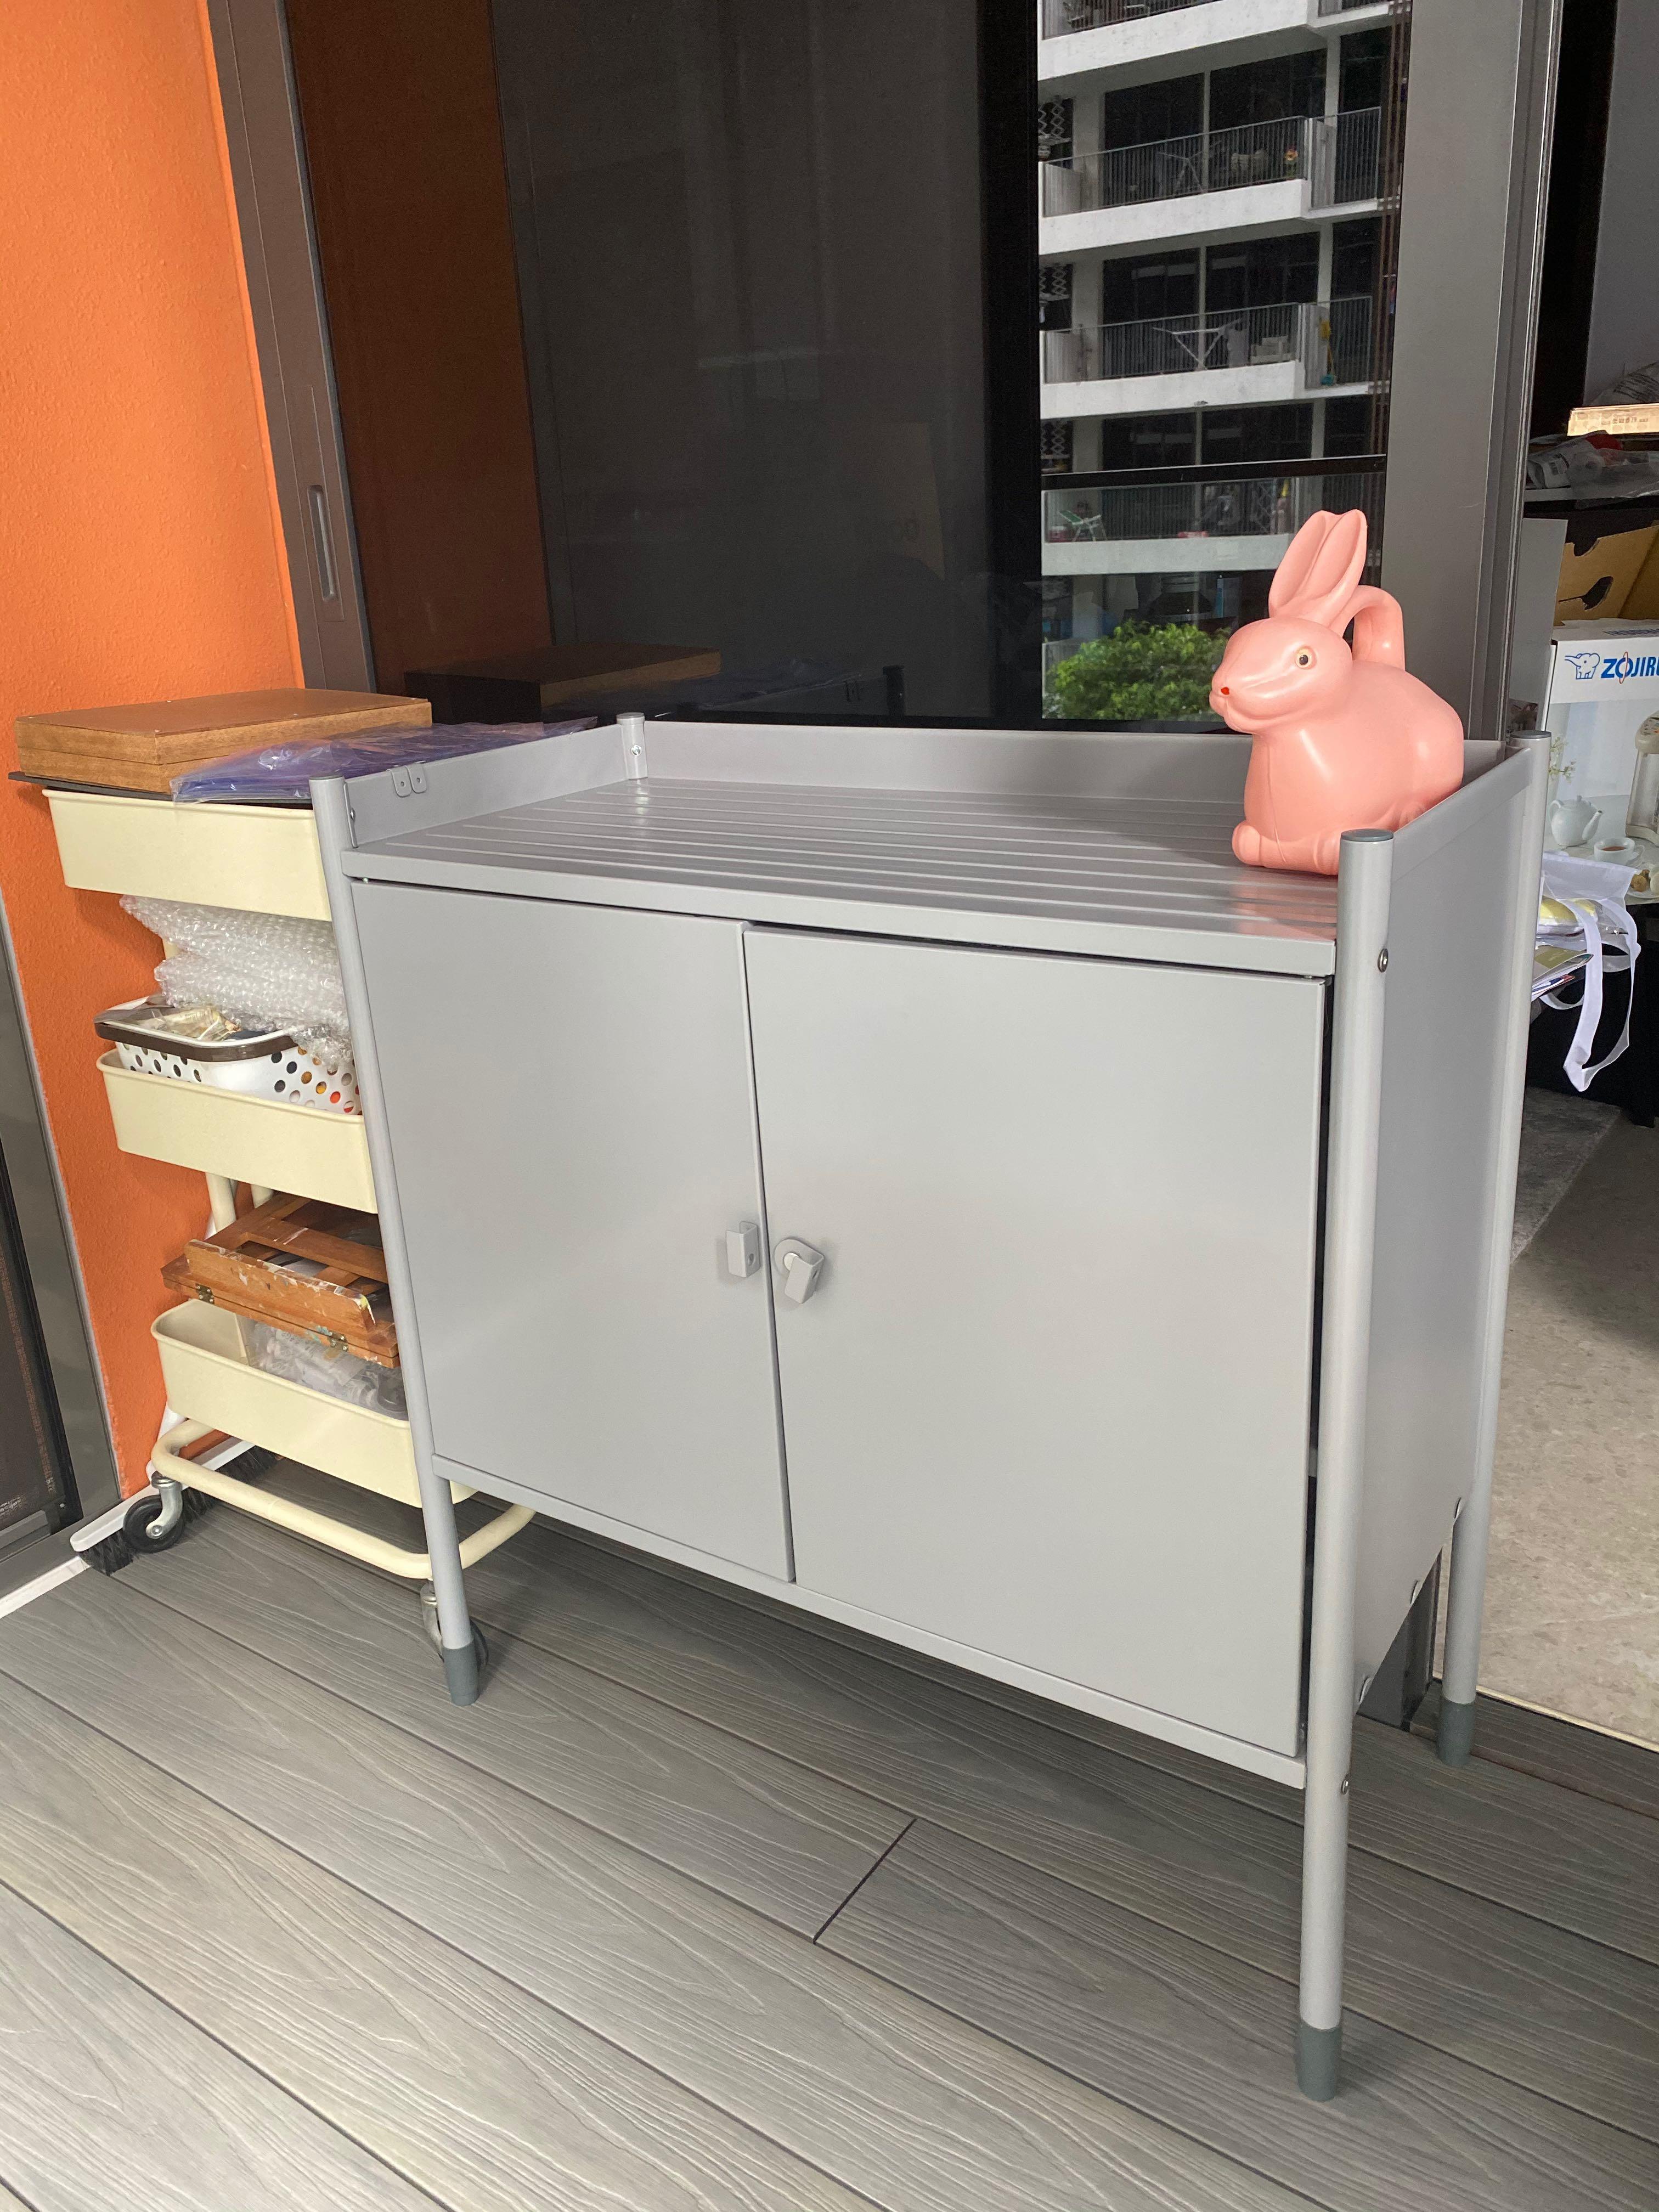 Ikea Hindo Outdoor Cabinet Storage, Outdoor Storage Cabinets Waterproof Ikea